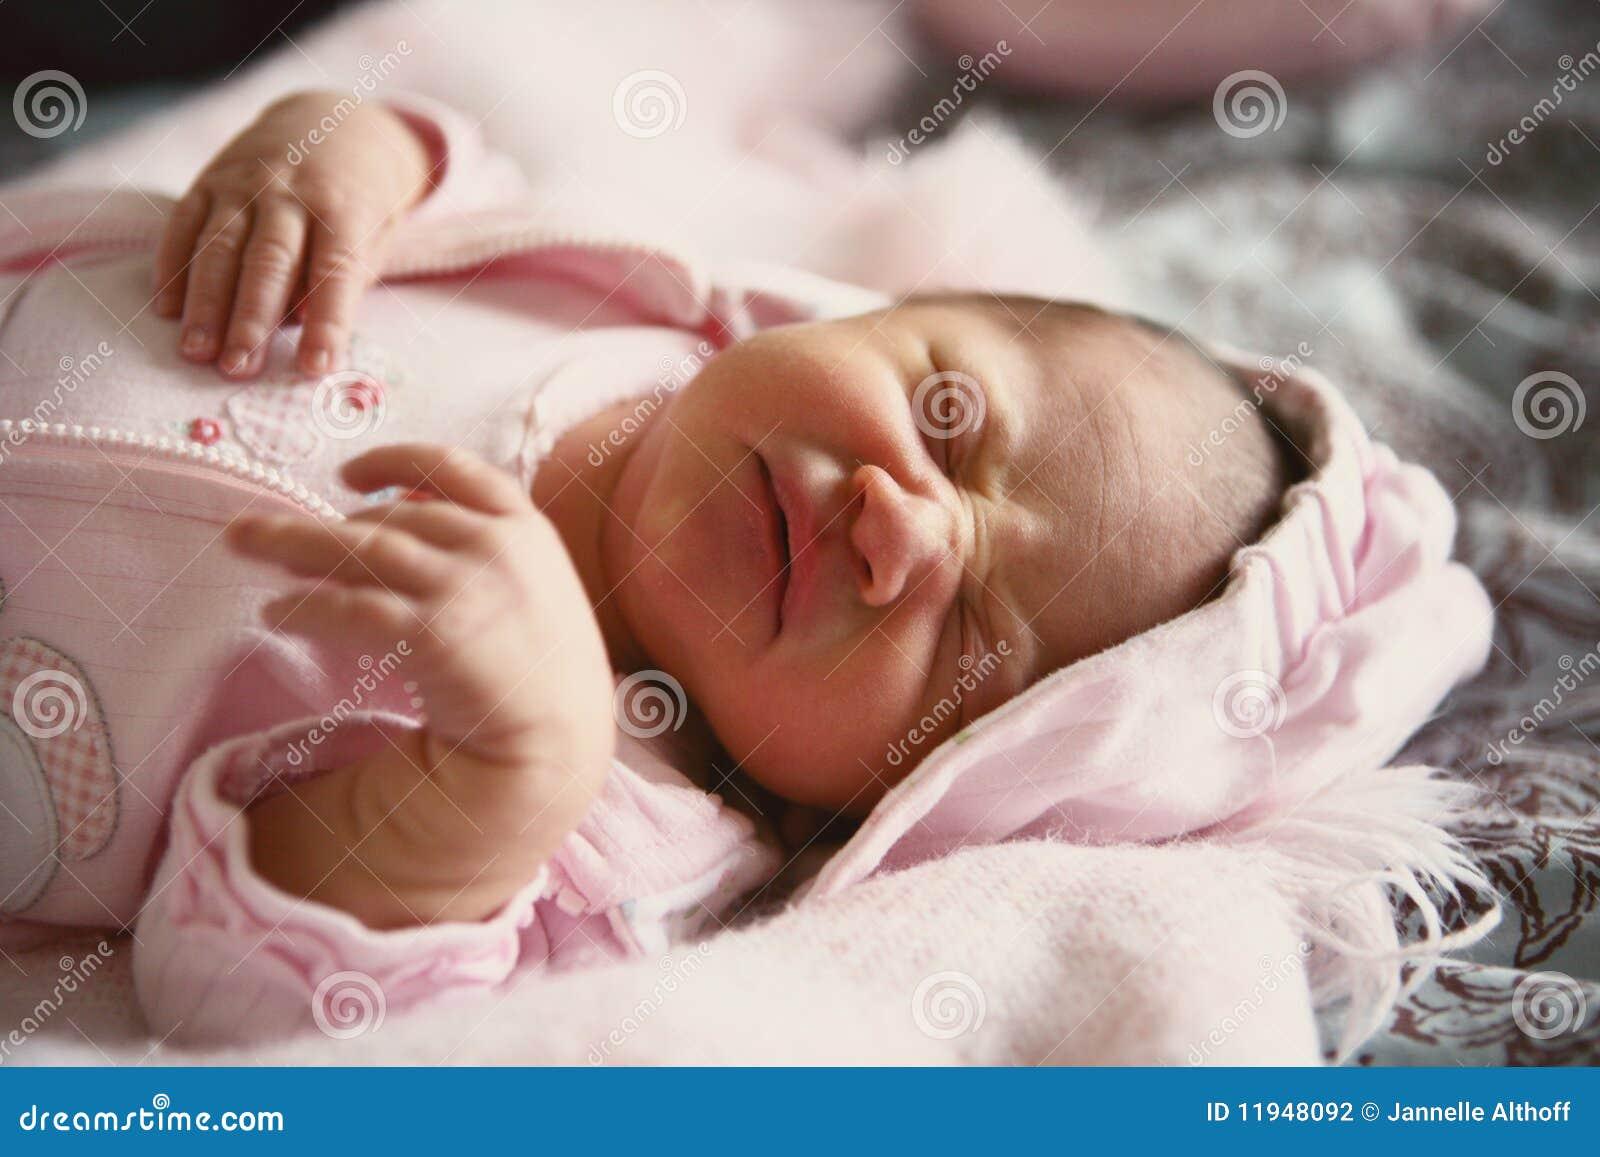 Upset Baby Stock Photography - Image: 11948092